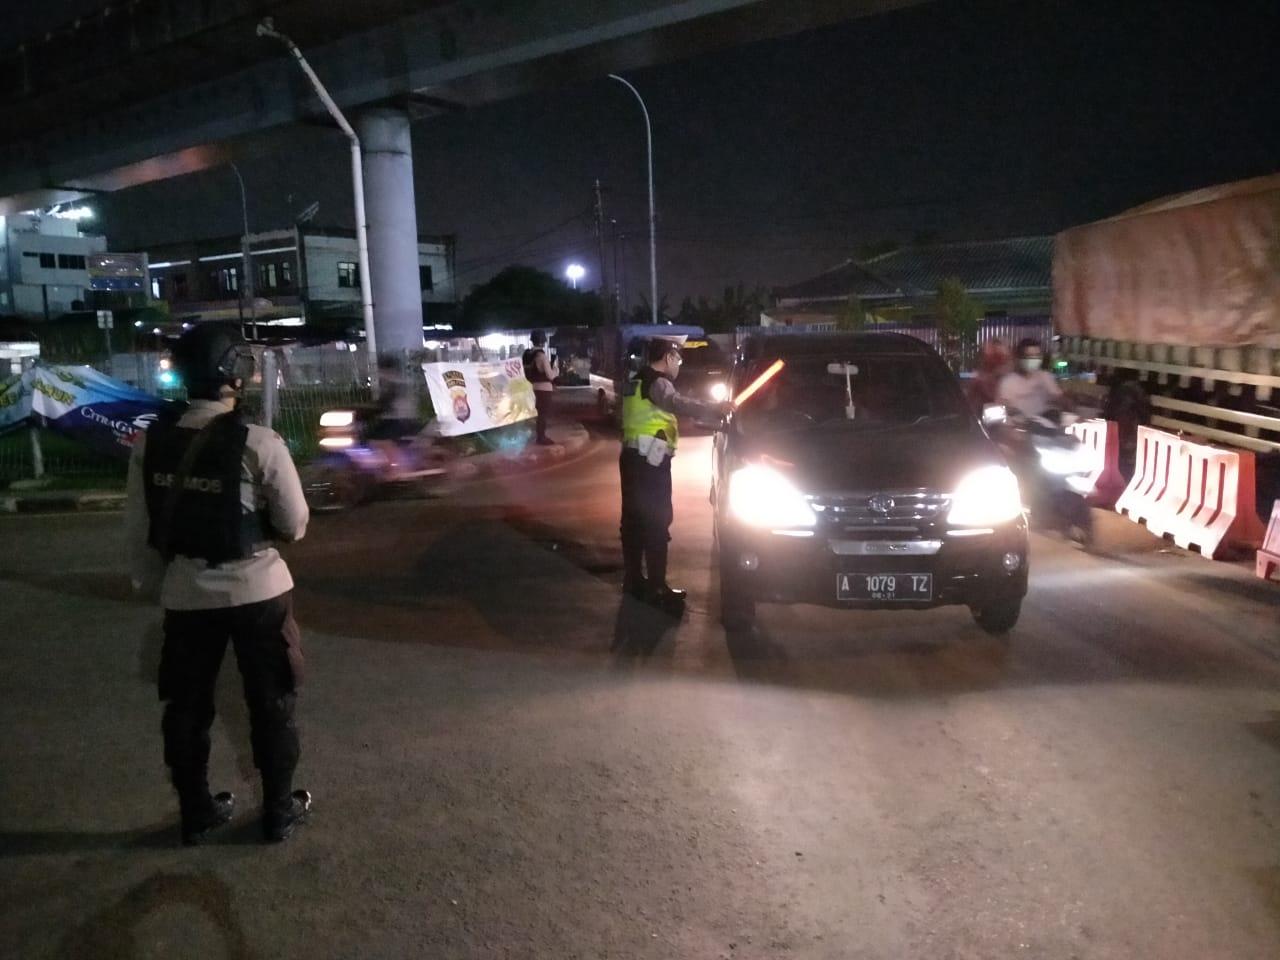 Cegah Pemudik, Polres Cilegon Perketat Pintu Keluar Tol Merak dan Pintu Masuk ASDP Merak